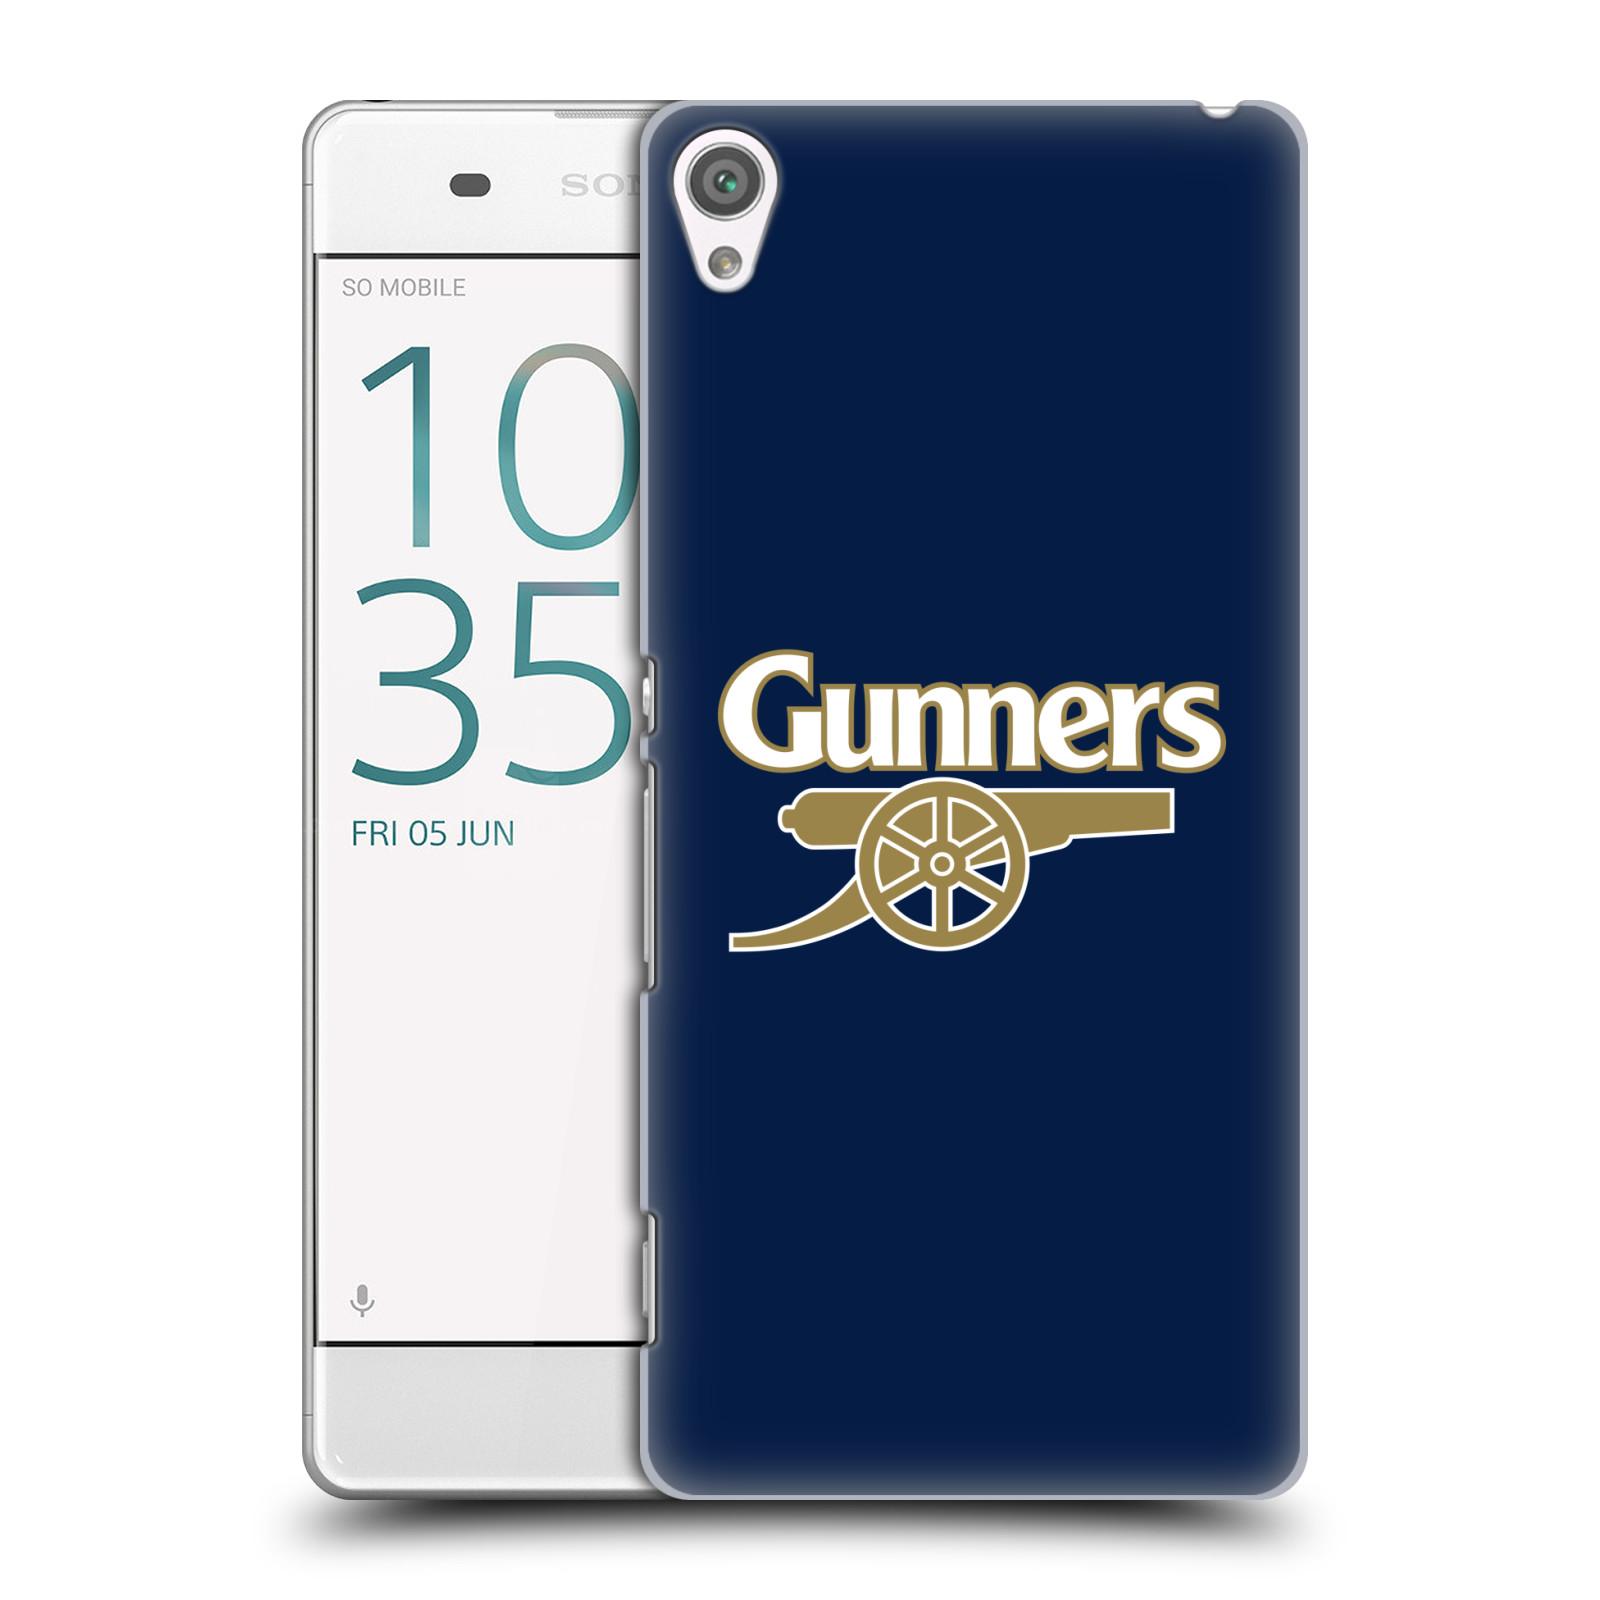 Plastové pouzdro na mobil Sony Xperia XA - Head Case - Arsenal FC - Gunners